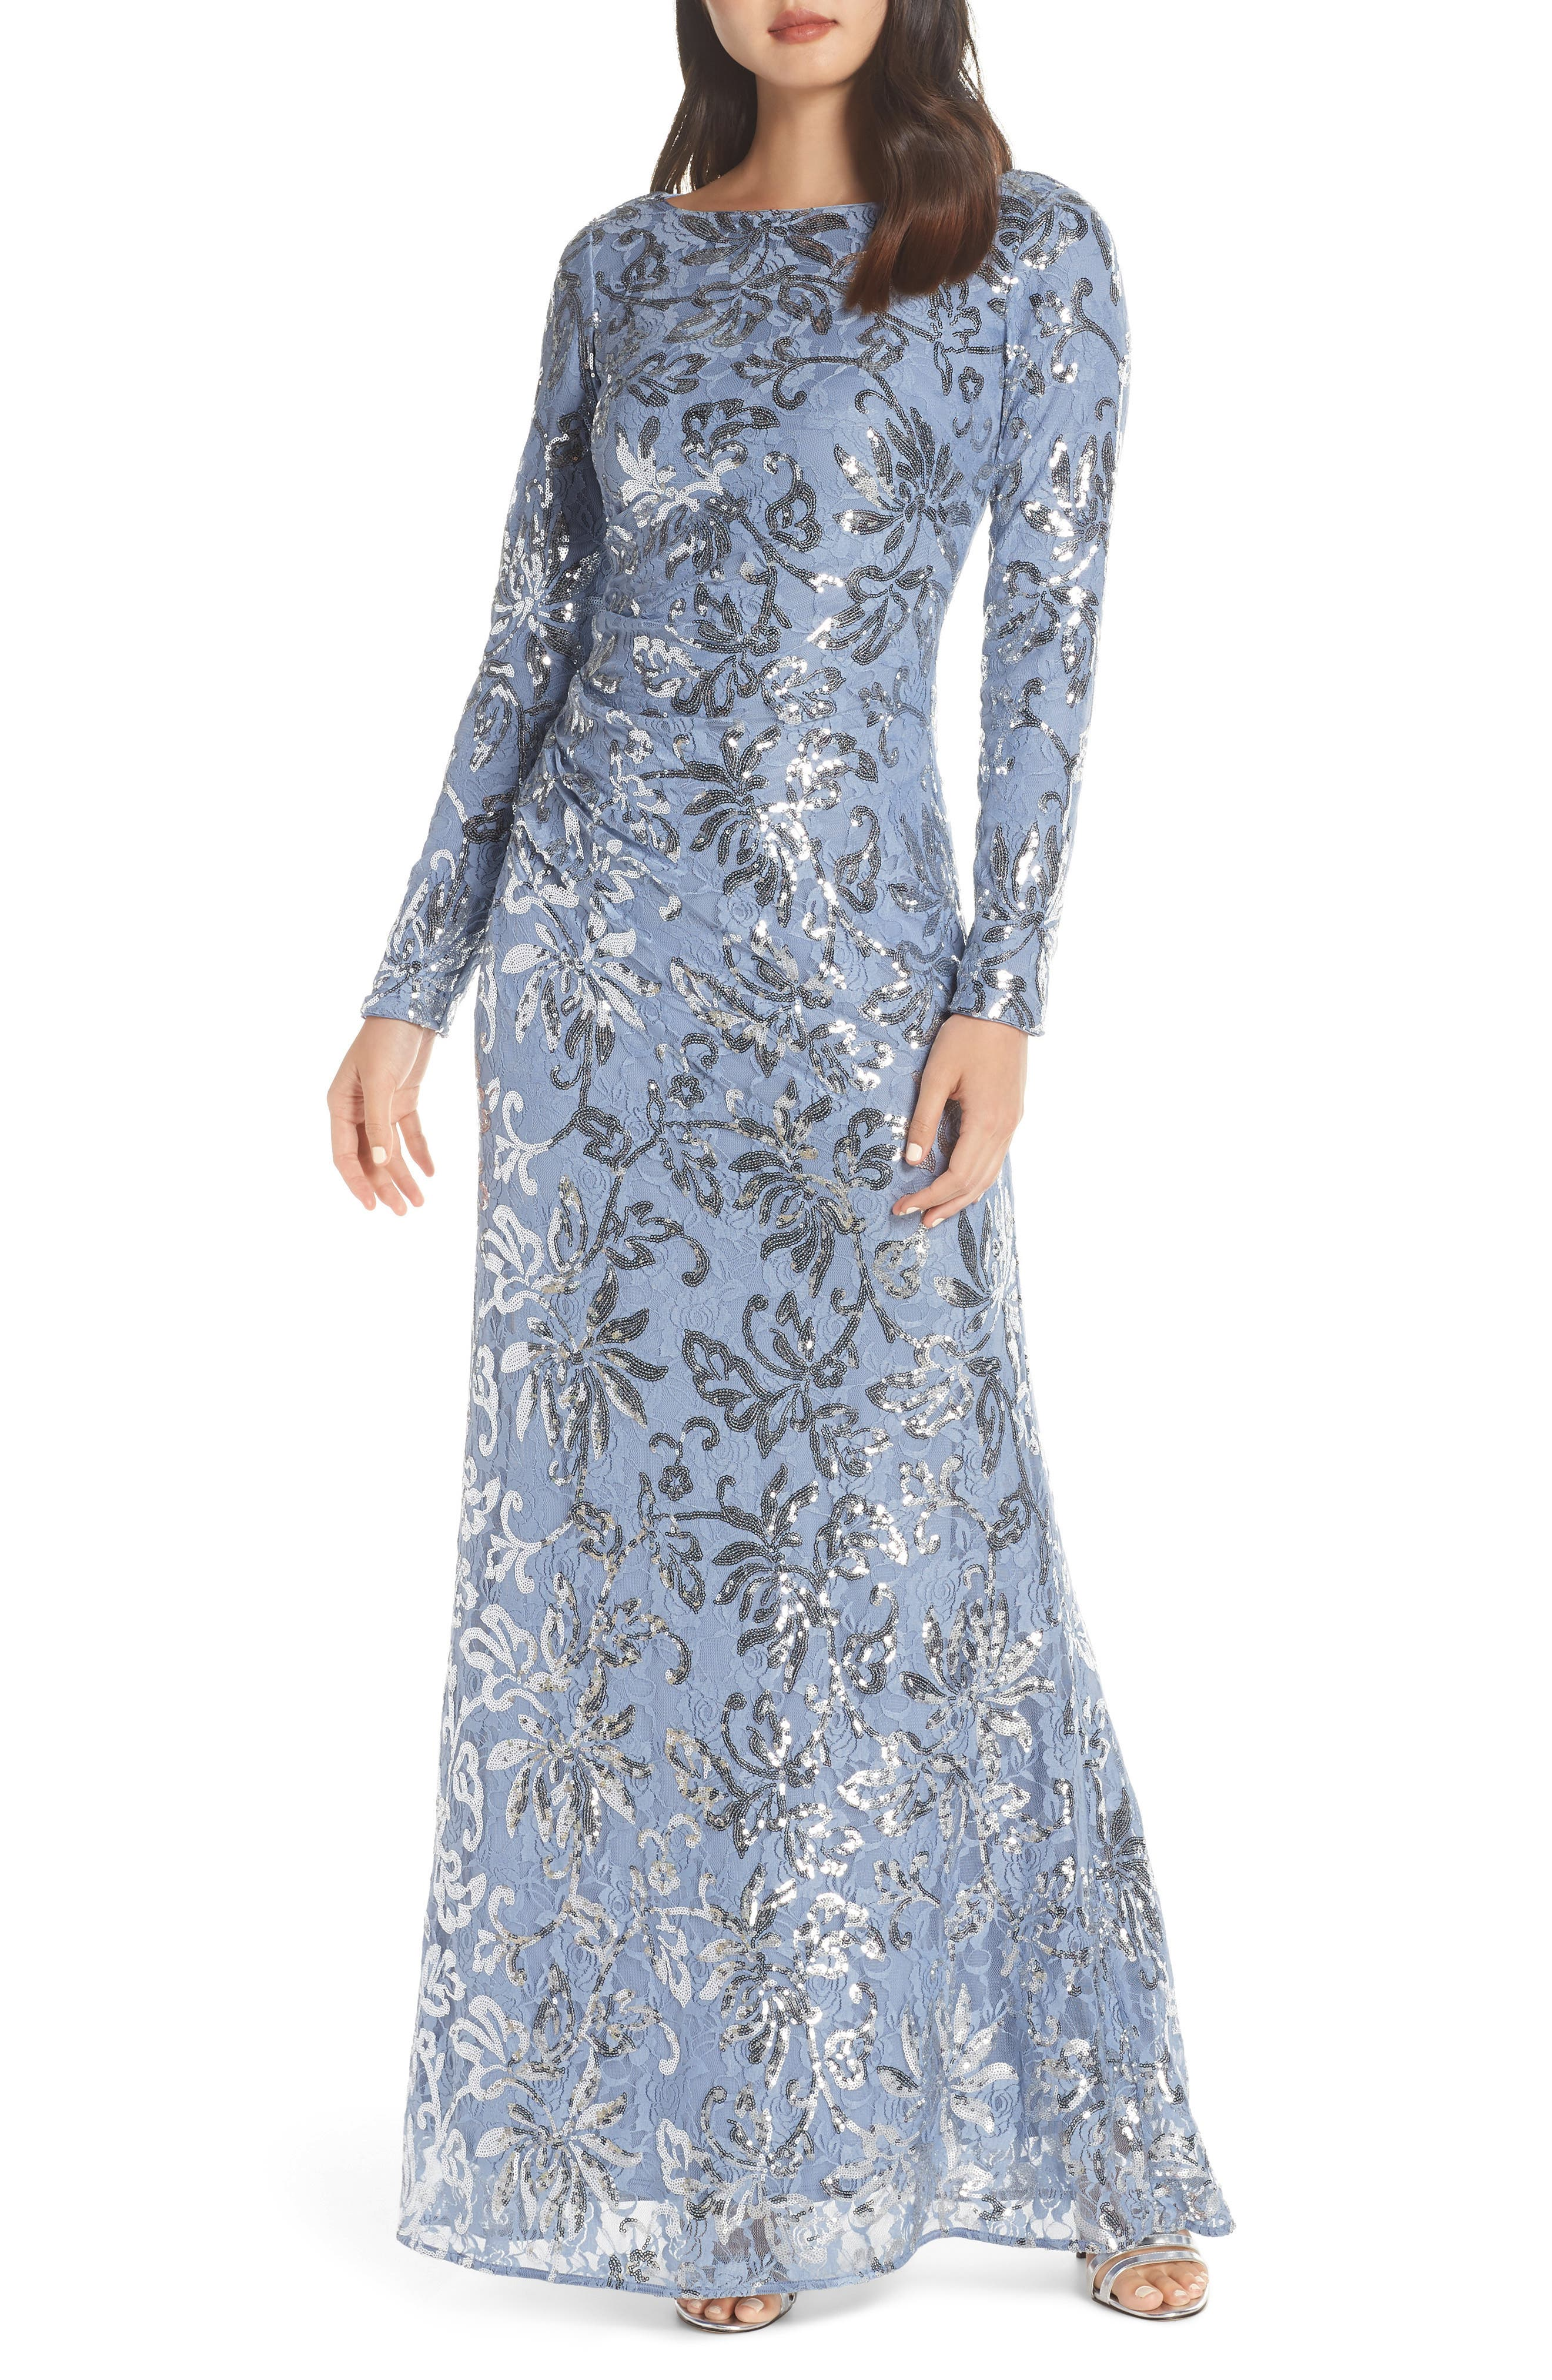 VINCE CAMUTO, Lace & Sequin Evening Dress, Main thumbnail 1, color, SKY BLUE